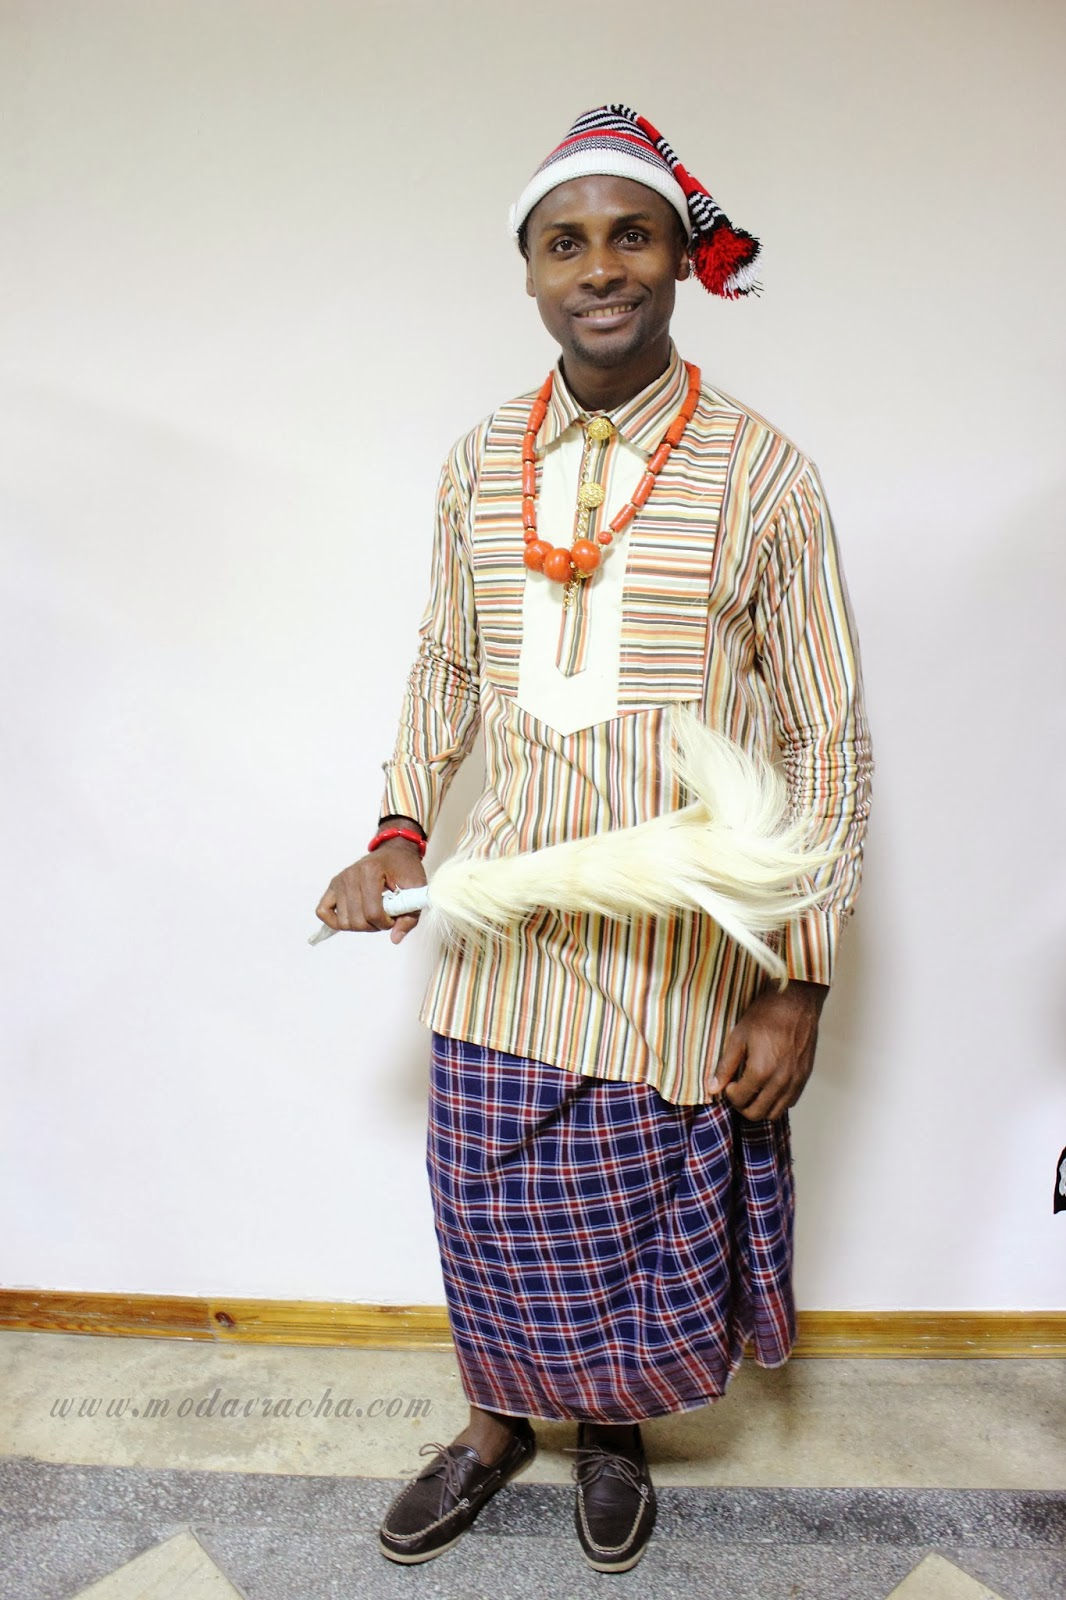 Igbo Native Attires 10 Traditional Clothing Worn By Stylish Men